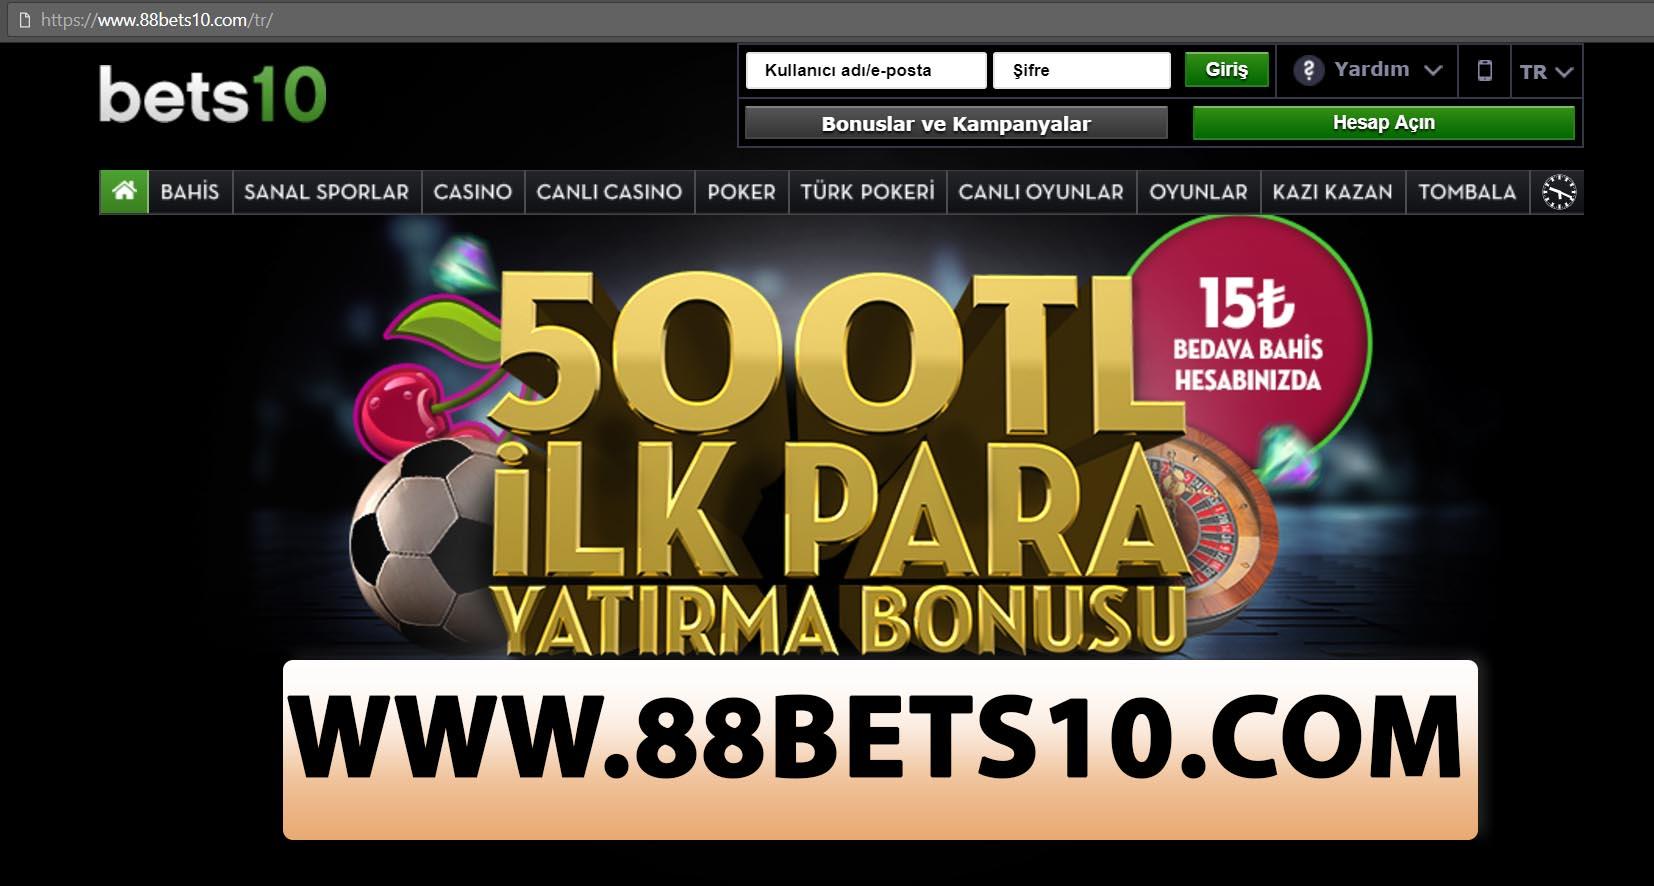 88Bets10.com En Güncel Adres Oldu